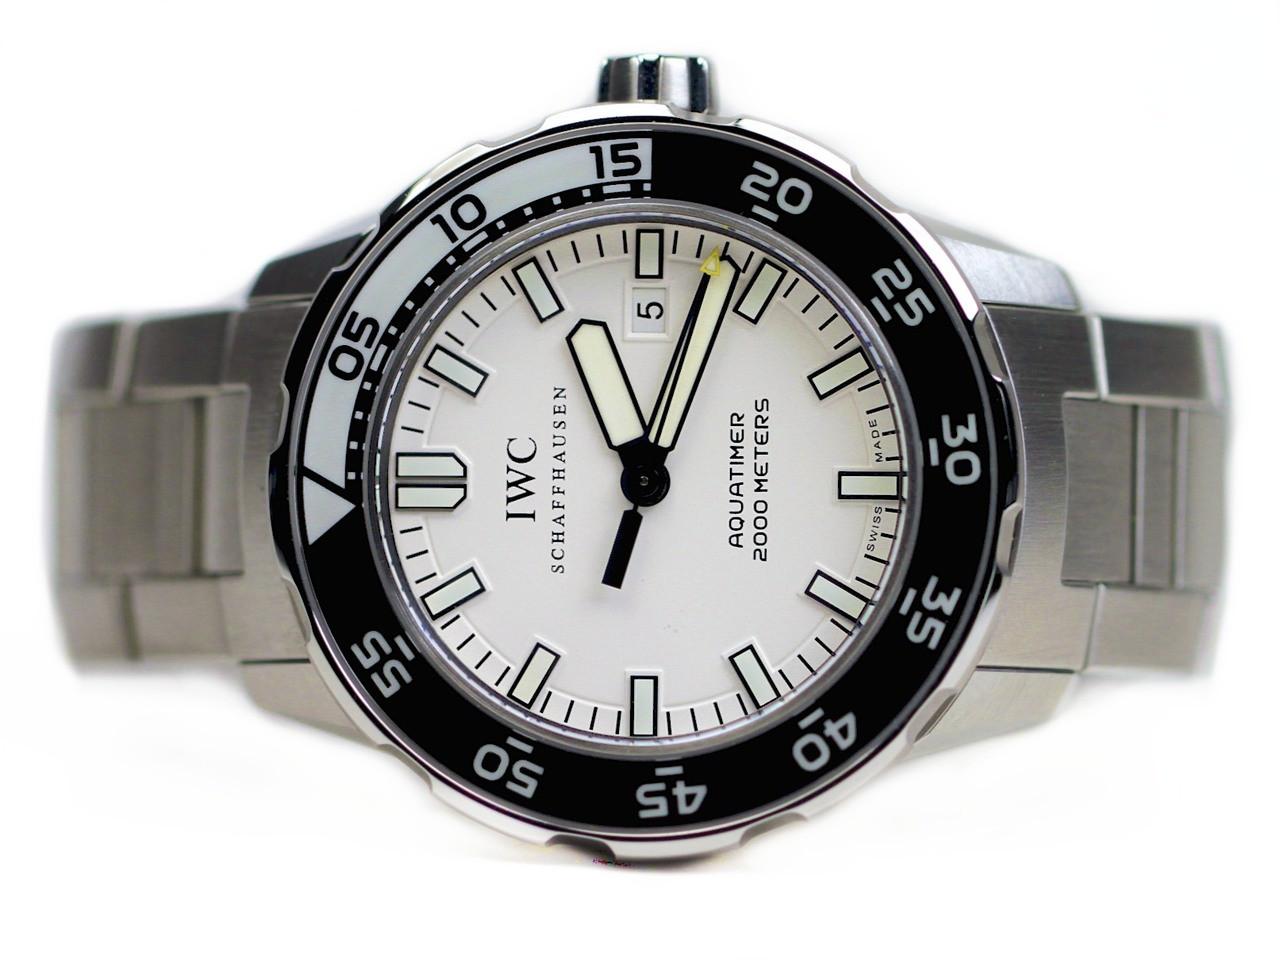 IWC Watch - Aquatimer 2000 Automatic IW356809 - www.Legendoftime.com - Chicago Watch Center